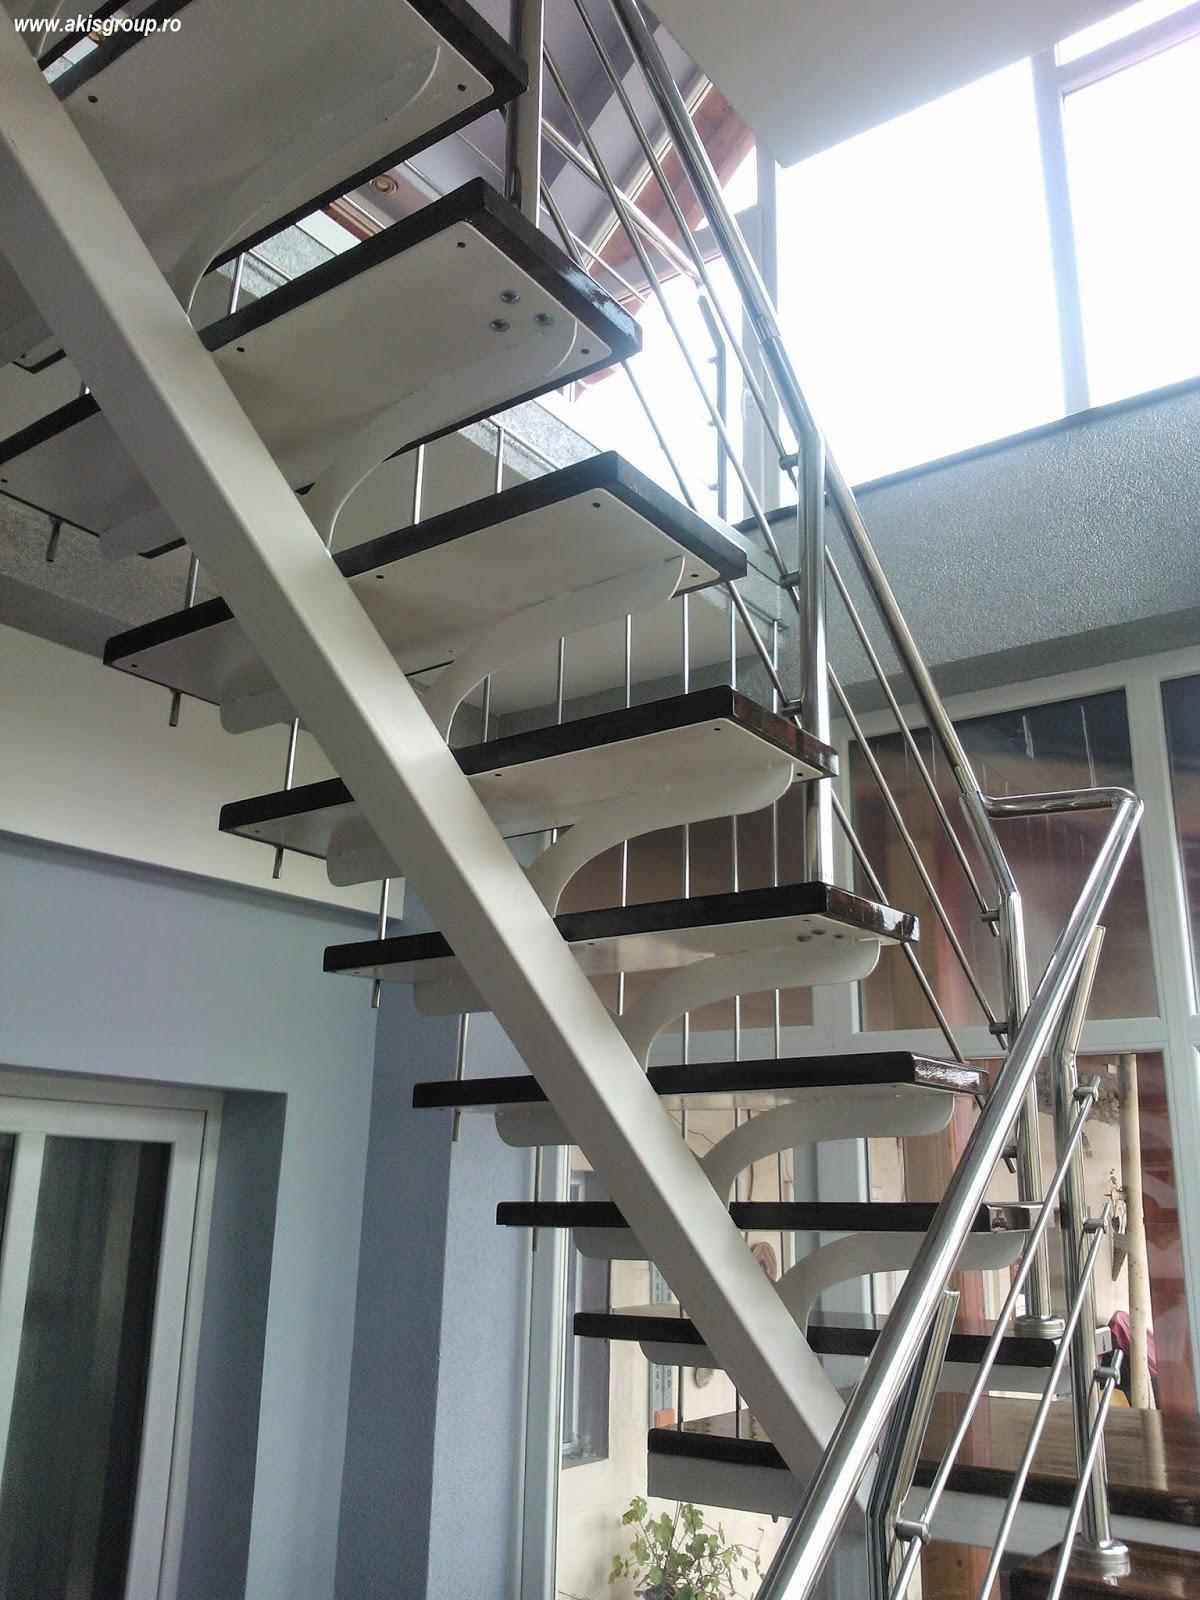 scari de interior scari de interior vopsite alb. Black Bedroom Furniture Sets. Home Design Ideas